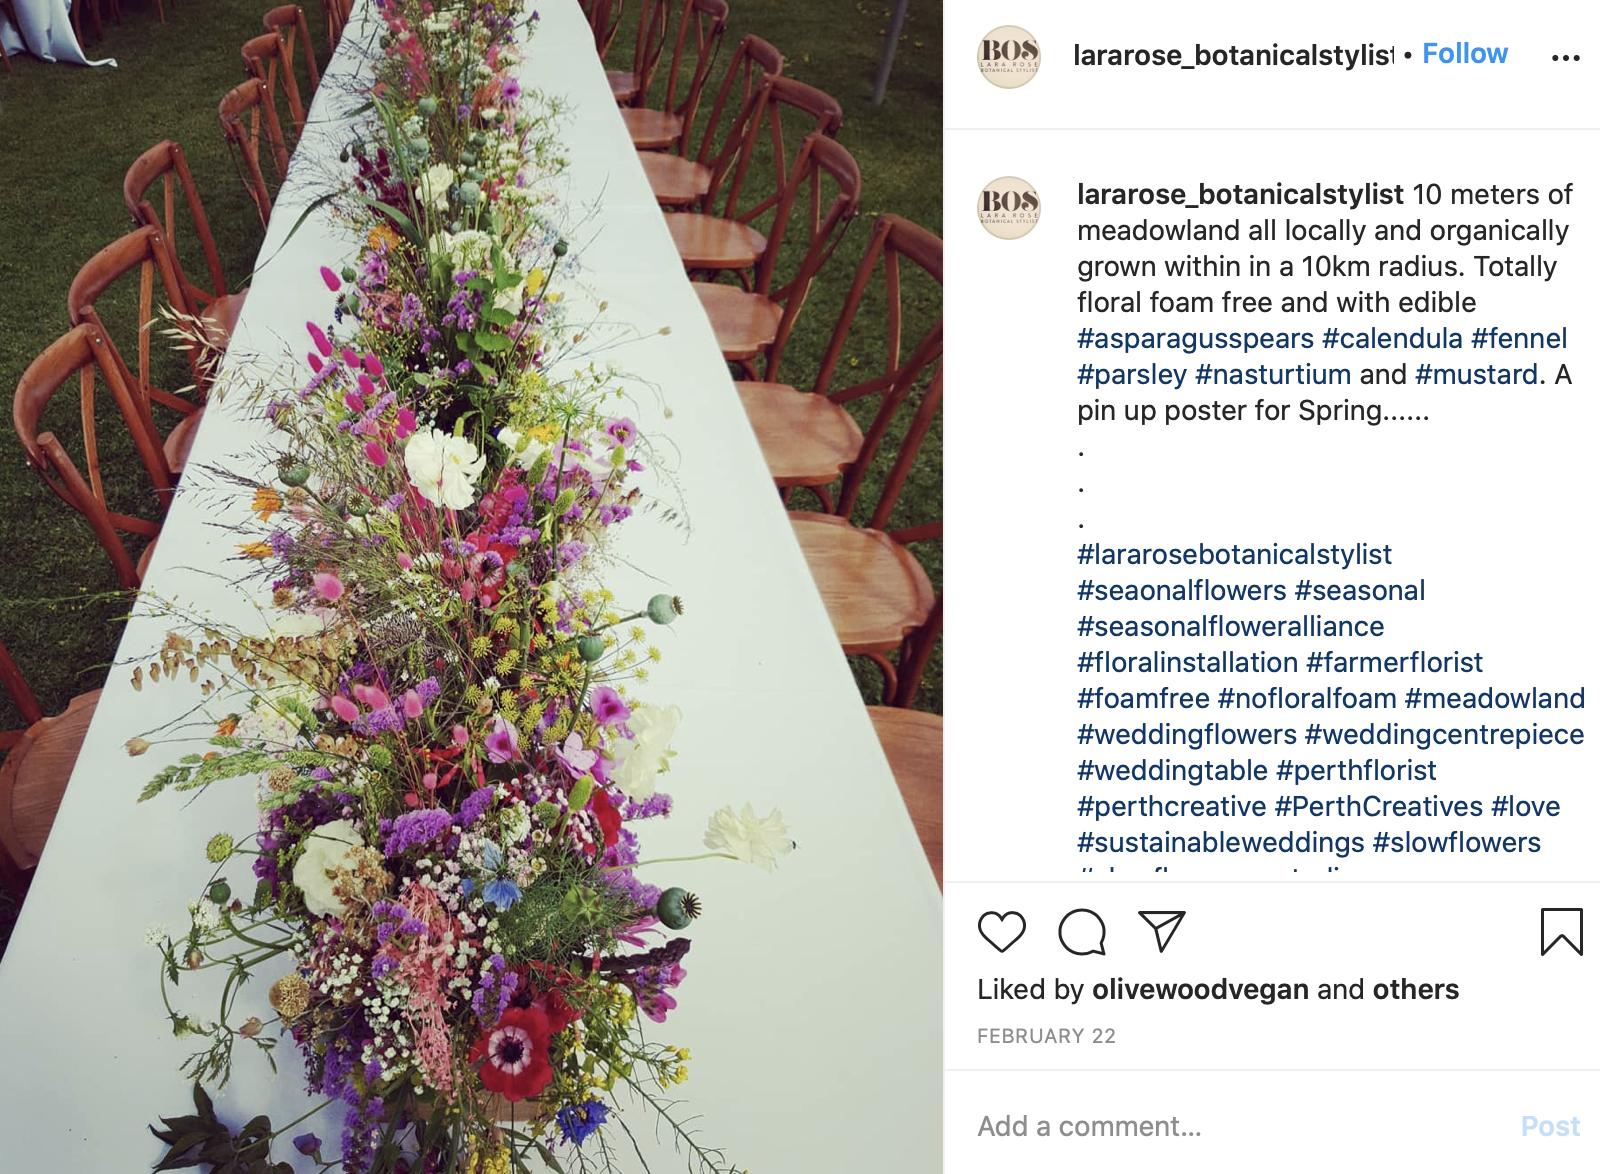 eco-friendly themed wedding